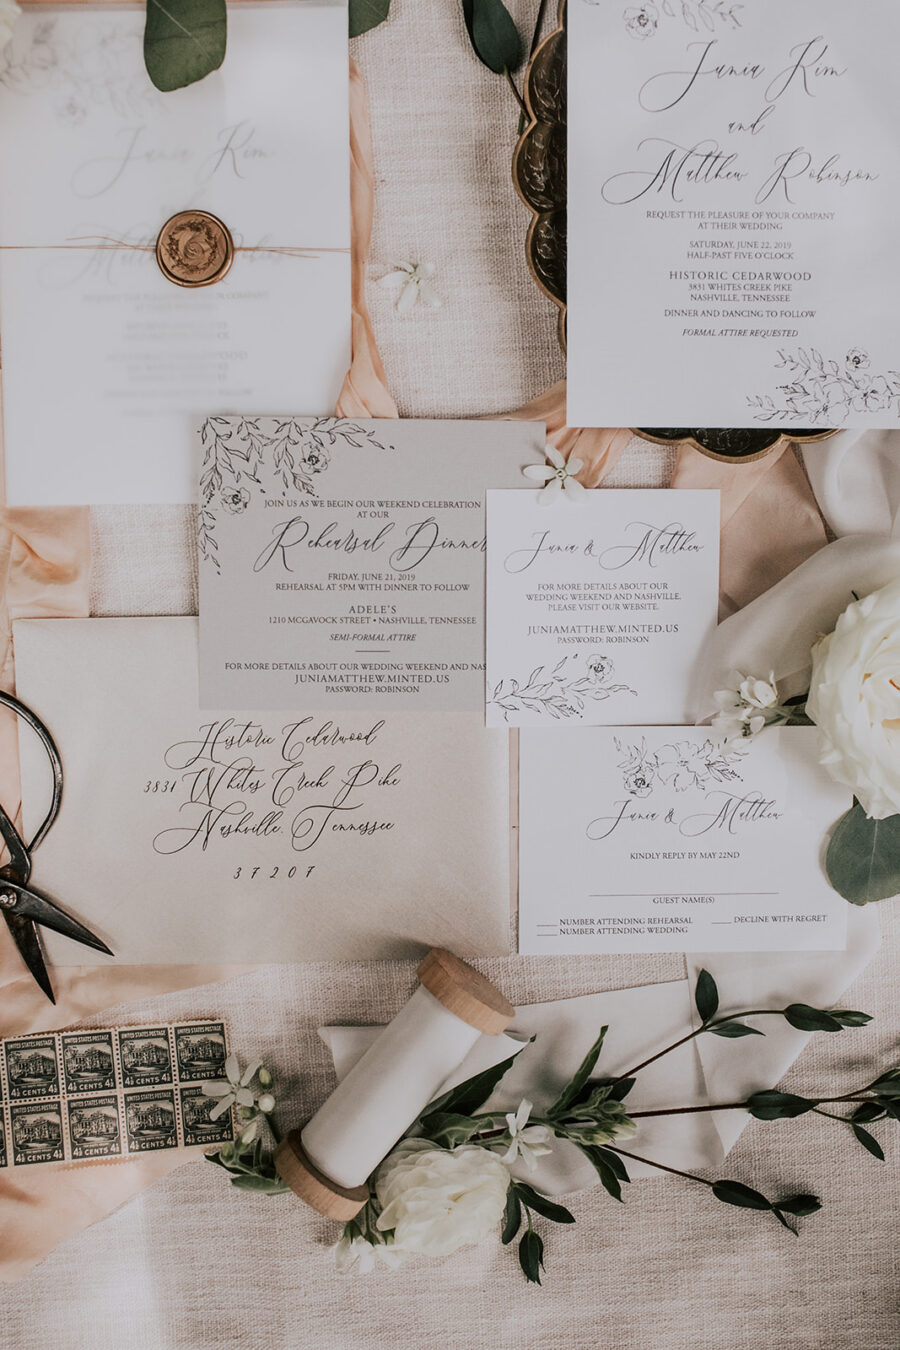 Elegant wedding invitations: Summer Soiree at Cedarwood Weddings featured on Nashville Bride Guide